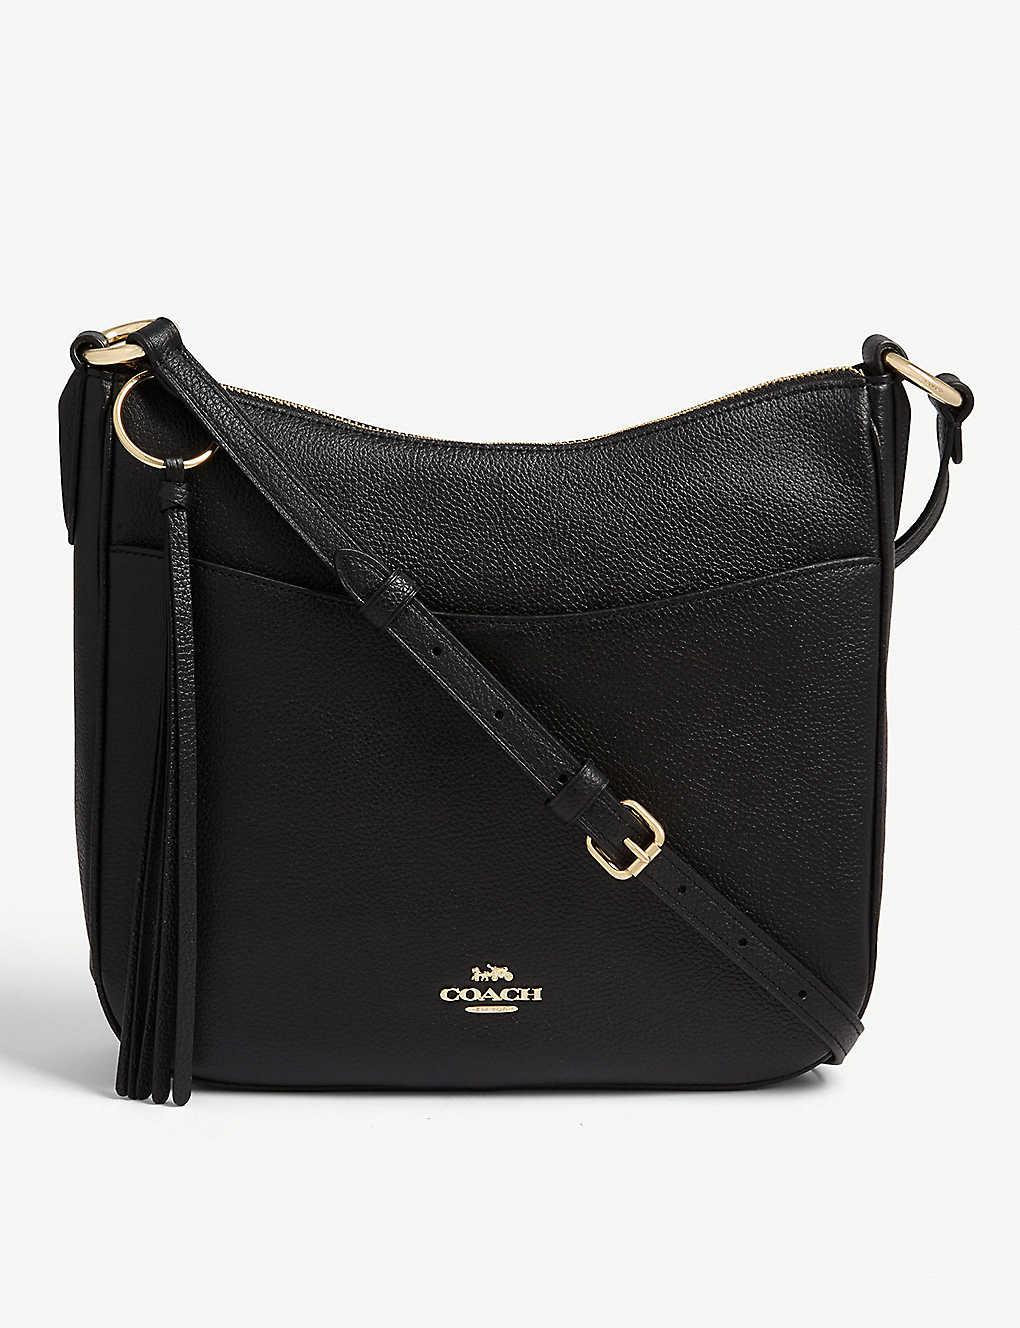 5f2a1b9c61977f COACH - Chaise leather cross-body bag | Selfridges.com